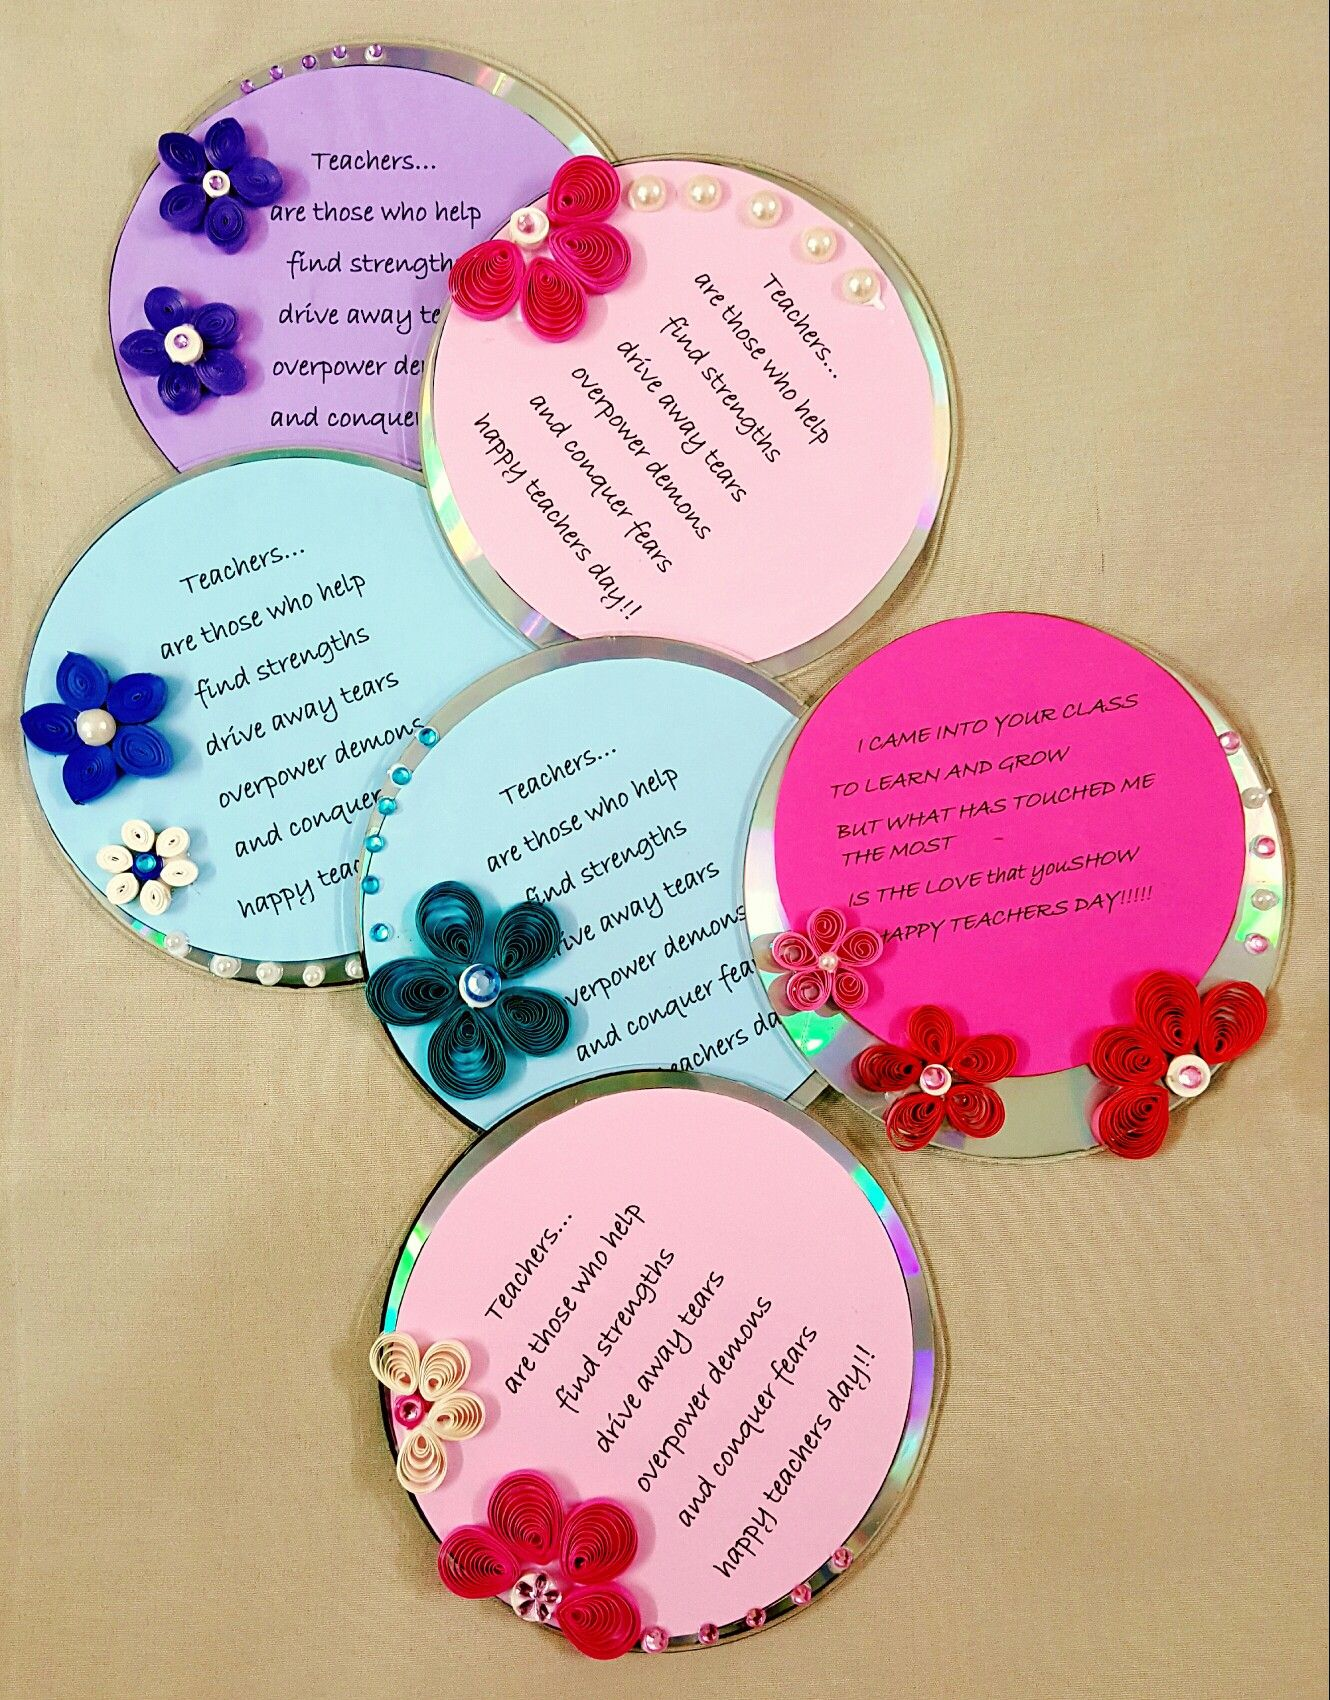 Creative ideas for handmade greeting cards teachers day billingss teachers day cards quilling on cd m4hsunfo